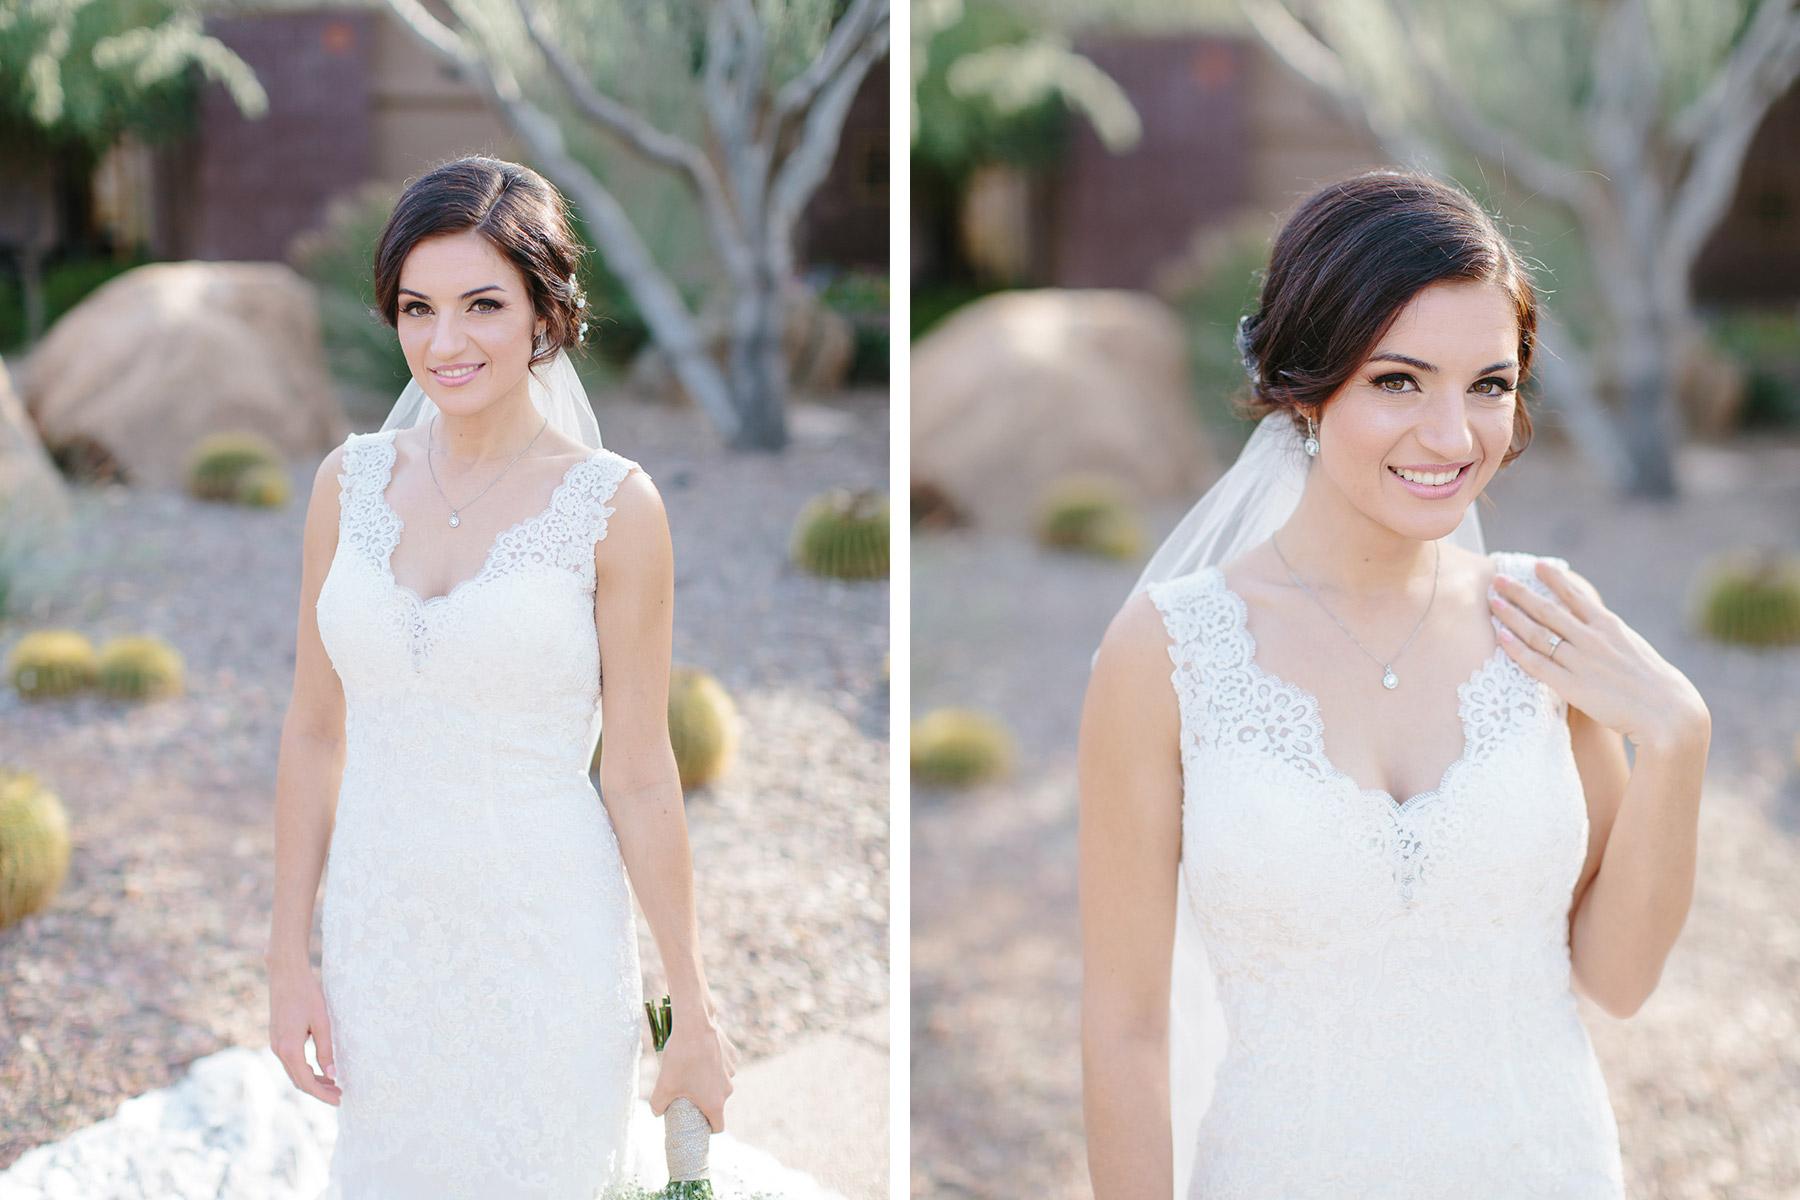 161210-Luxium-Weddings-Arizona-Matt-Jenny-Anthem-Golf-Country-Club-1009a.jpg